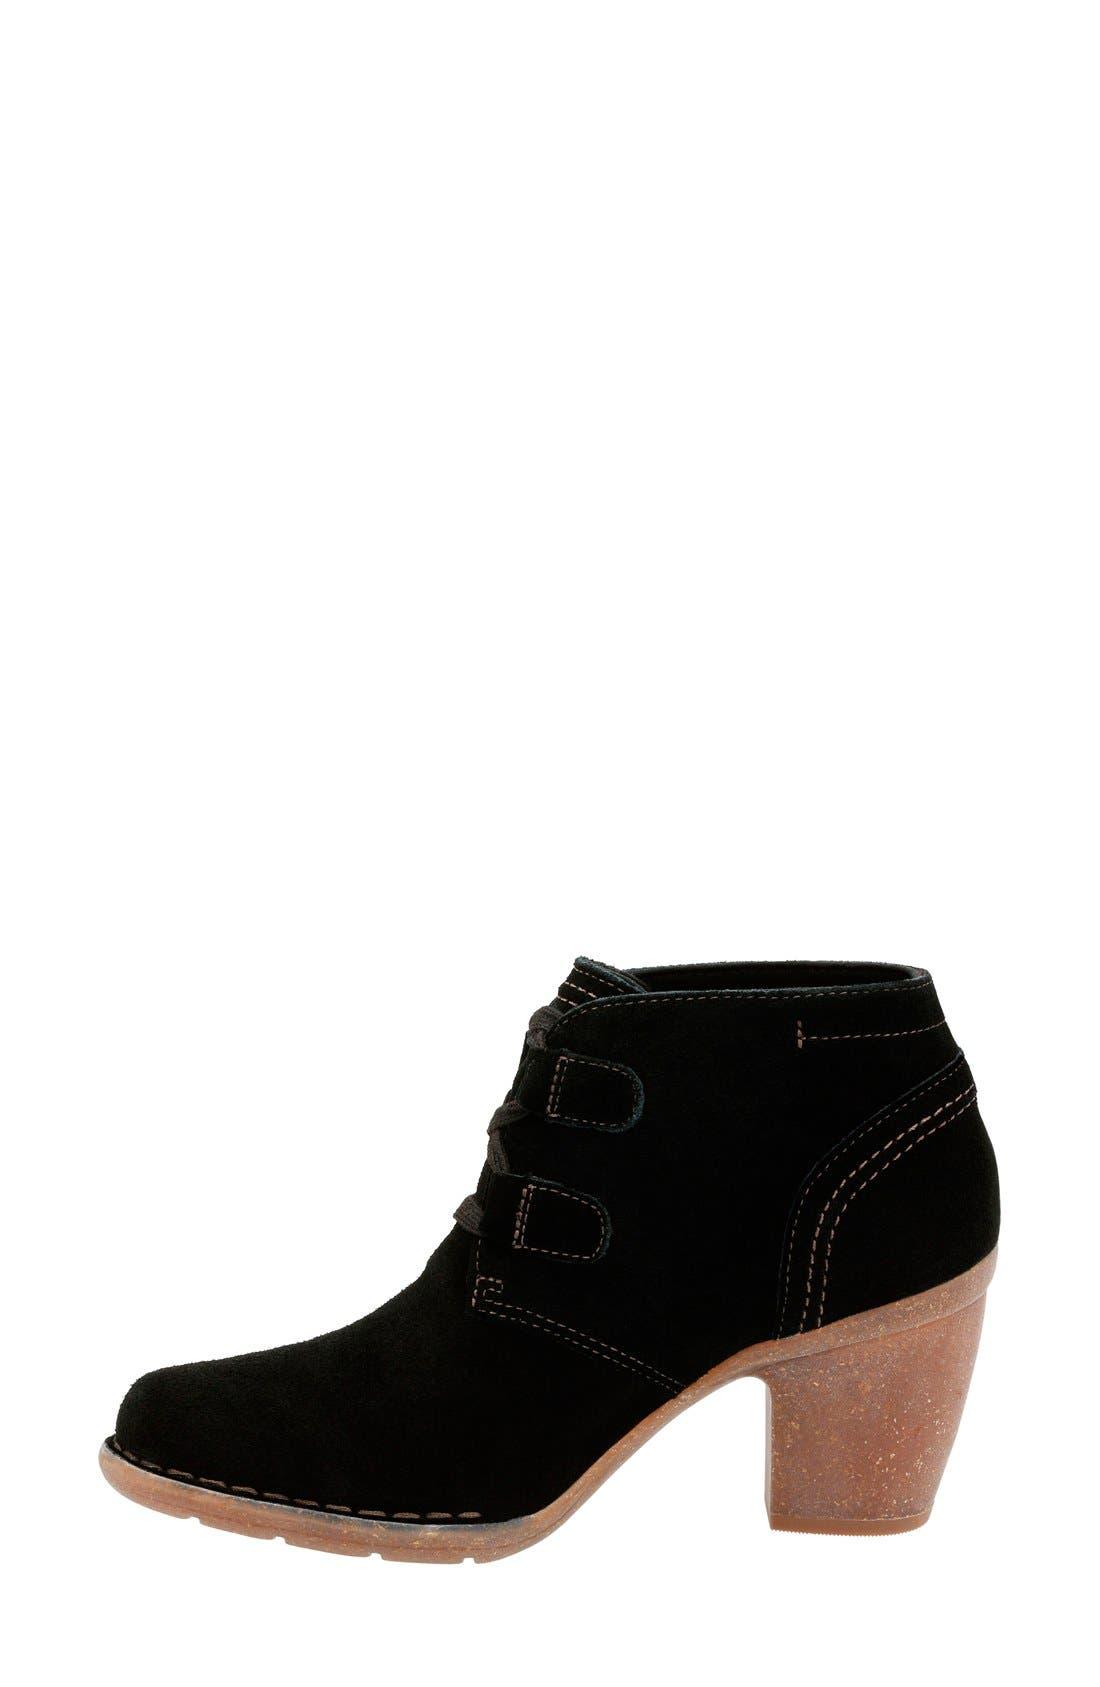 'Carleta Lyon' Ankle Boot,                             Alternate thumbnail 2, color,                             BLACK SUEDE